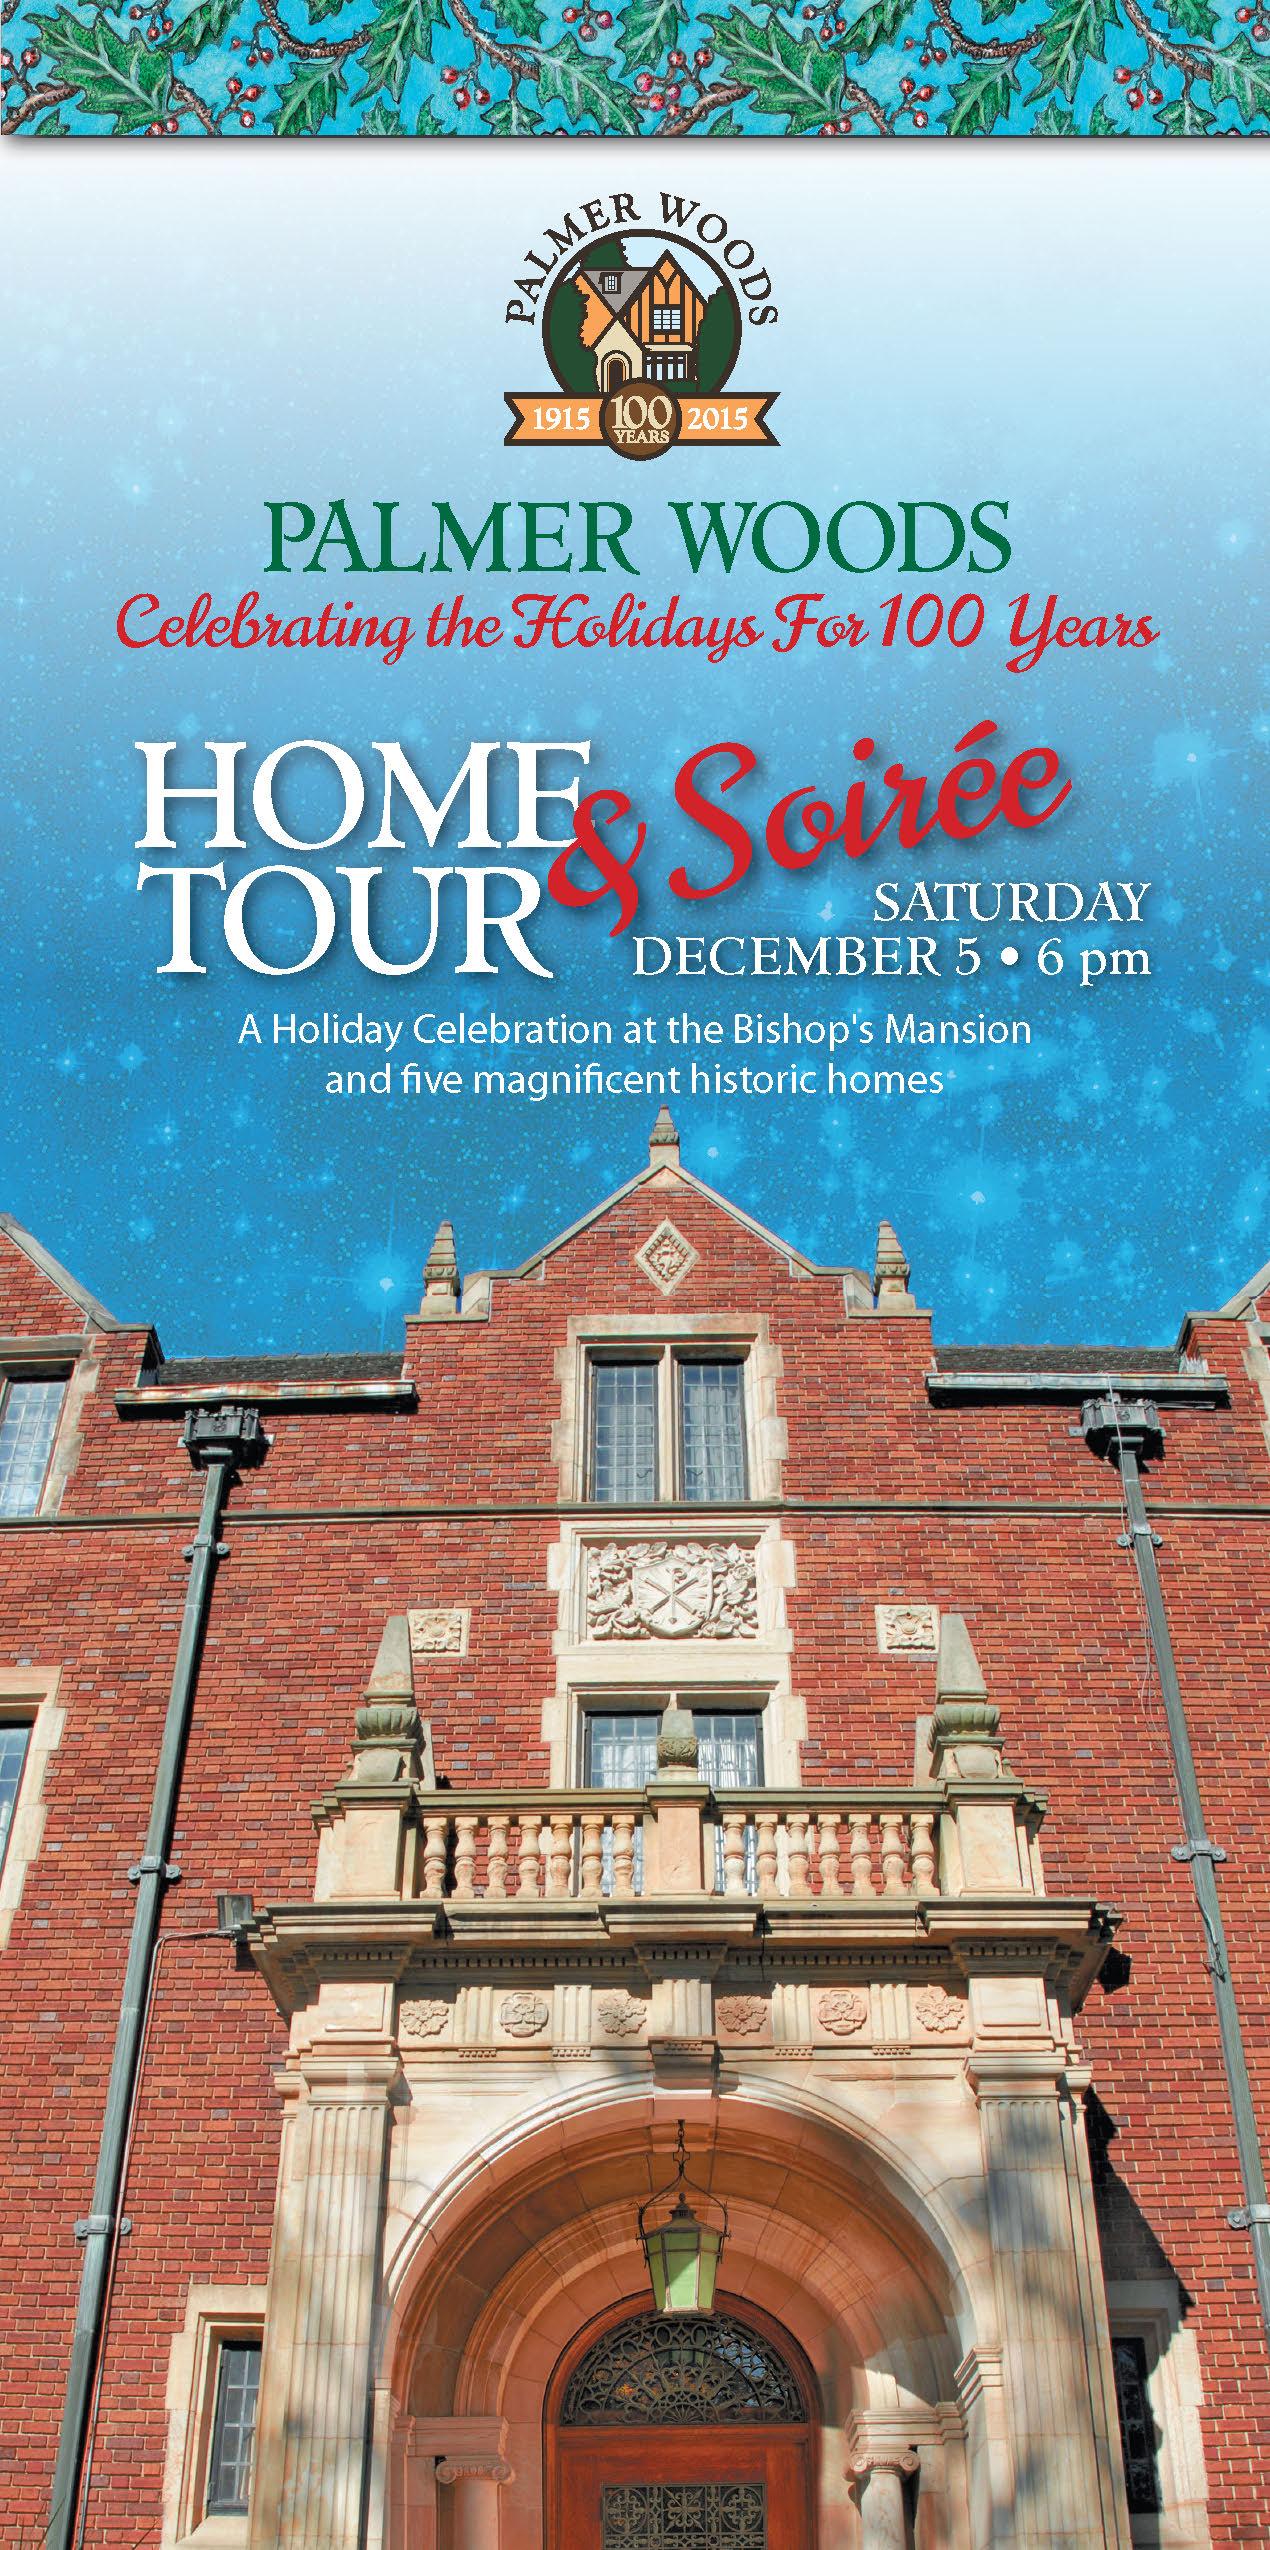 Tour Brochure cover